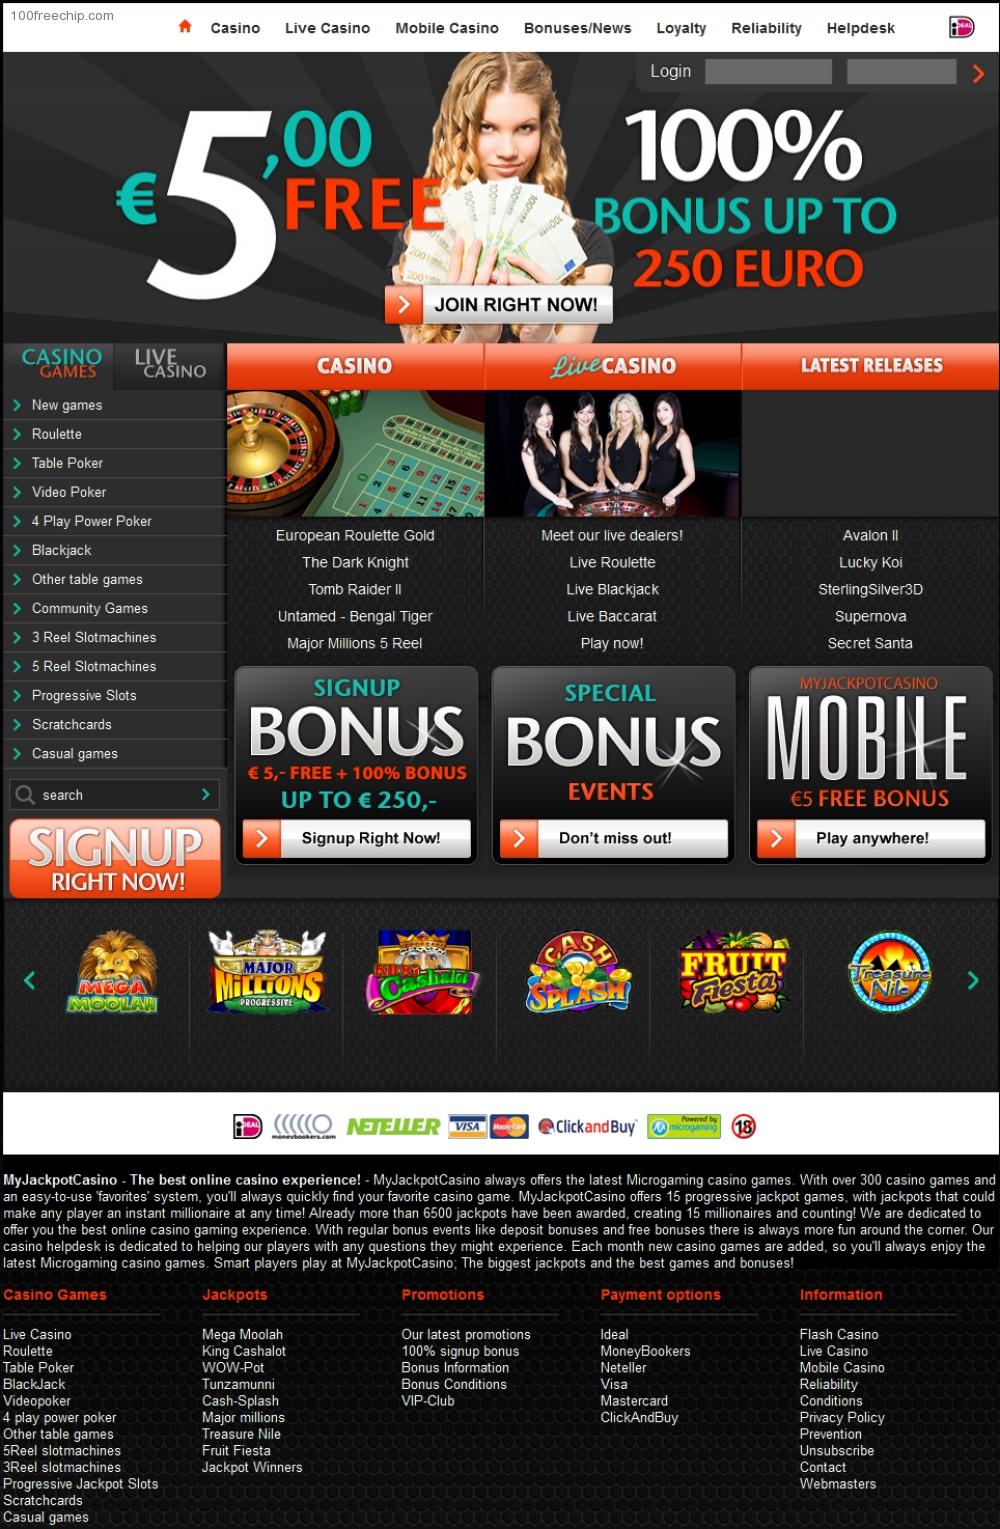 jackpot capital casino $100 free chip